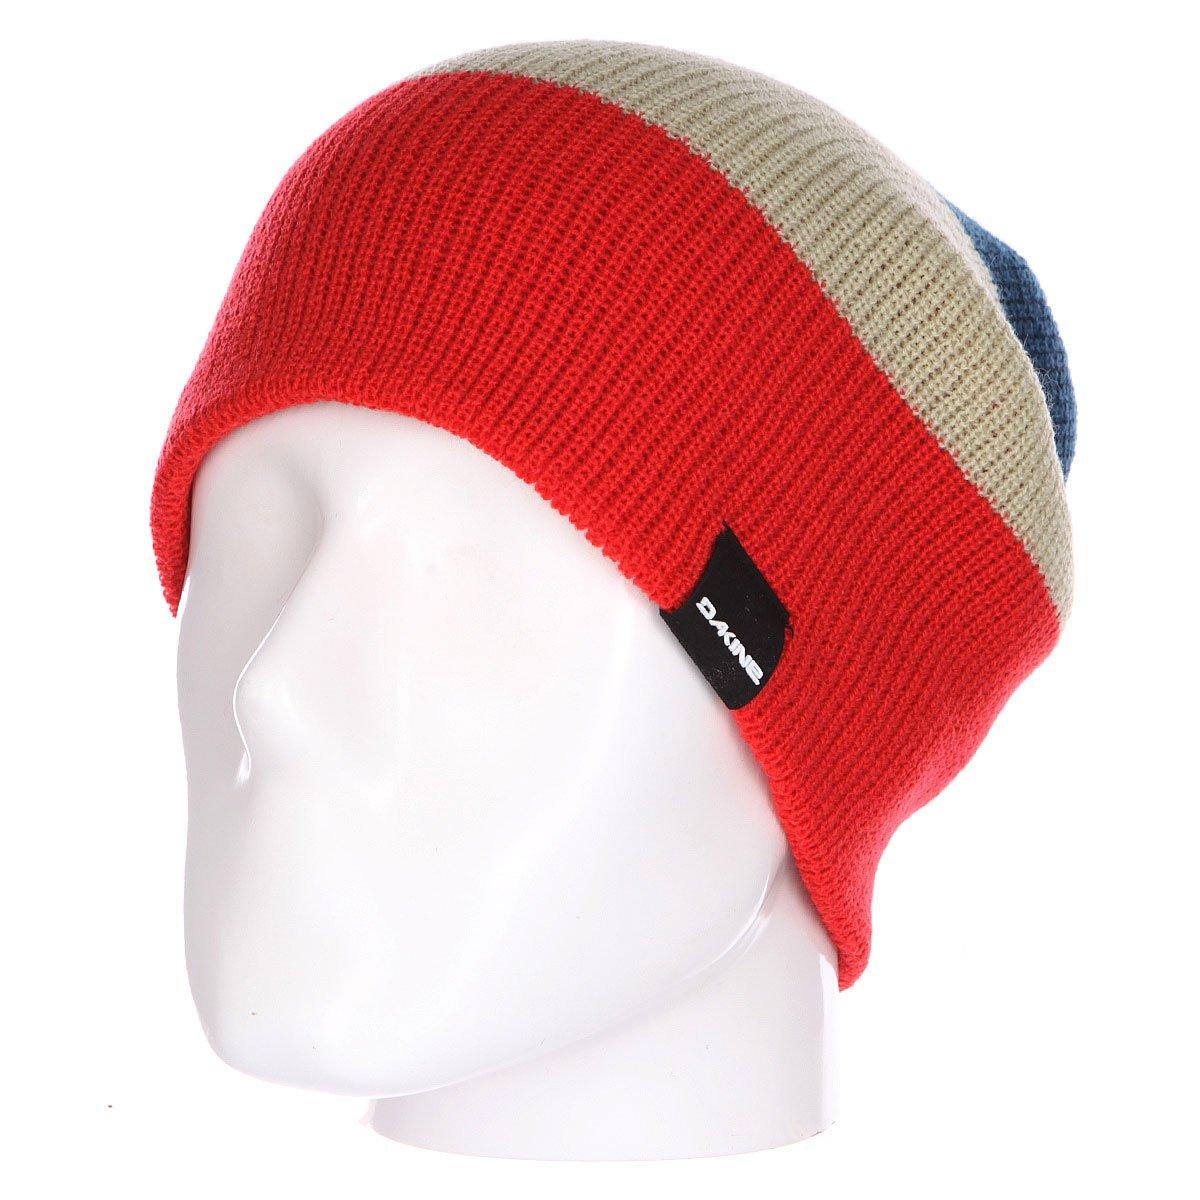 Купить шапку носок Dakine Lester Red Moroccan Blue в интернет-магазине  Proskater.by b7680da8538